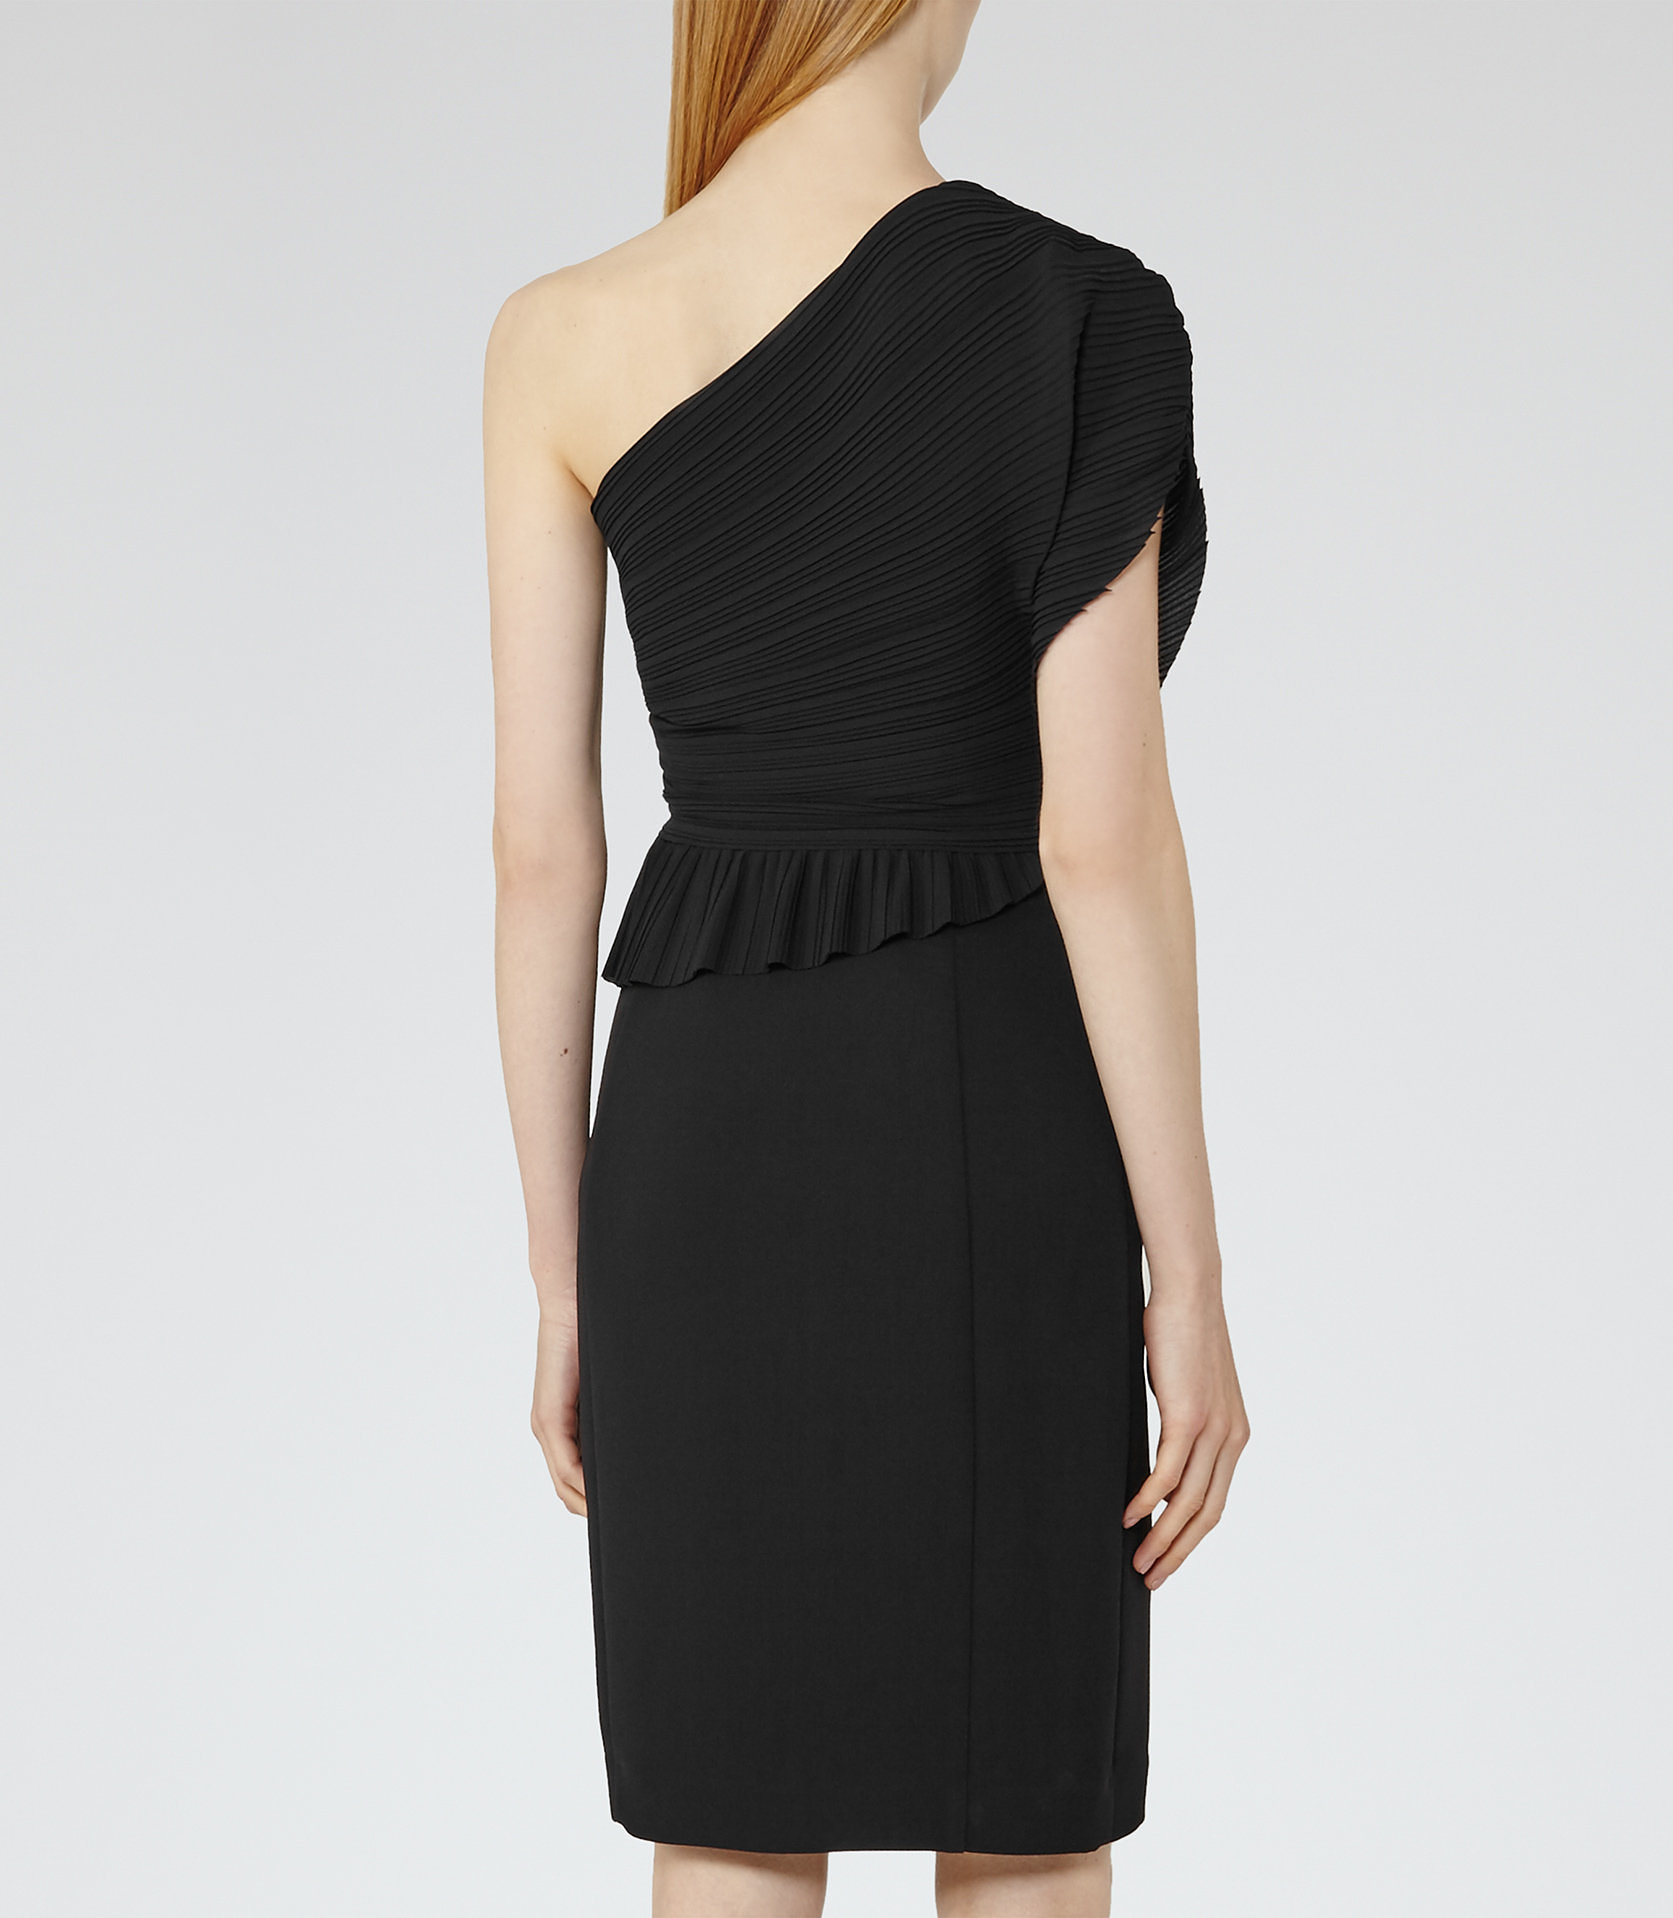 Jesse black dress3